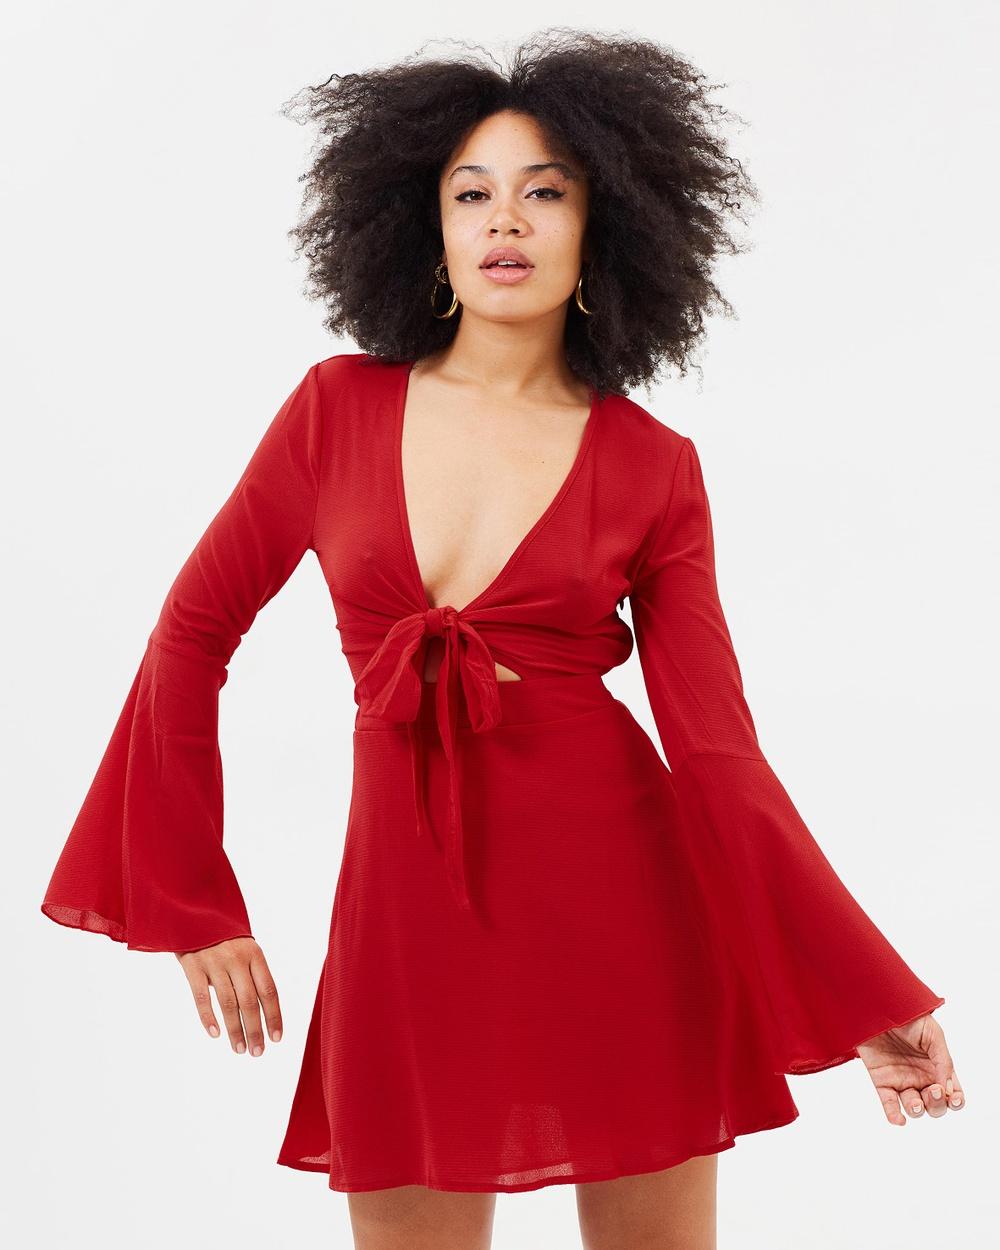 Missguided Tie Front Tea Dress Dresses Red Tie Front Tea Dress